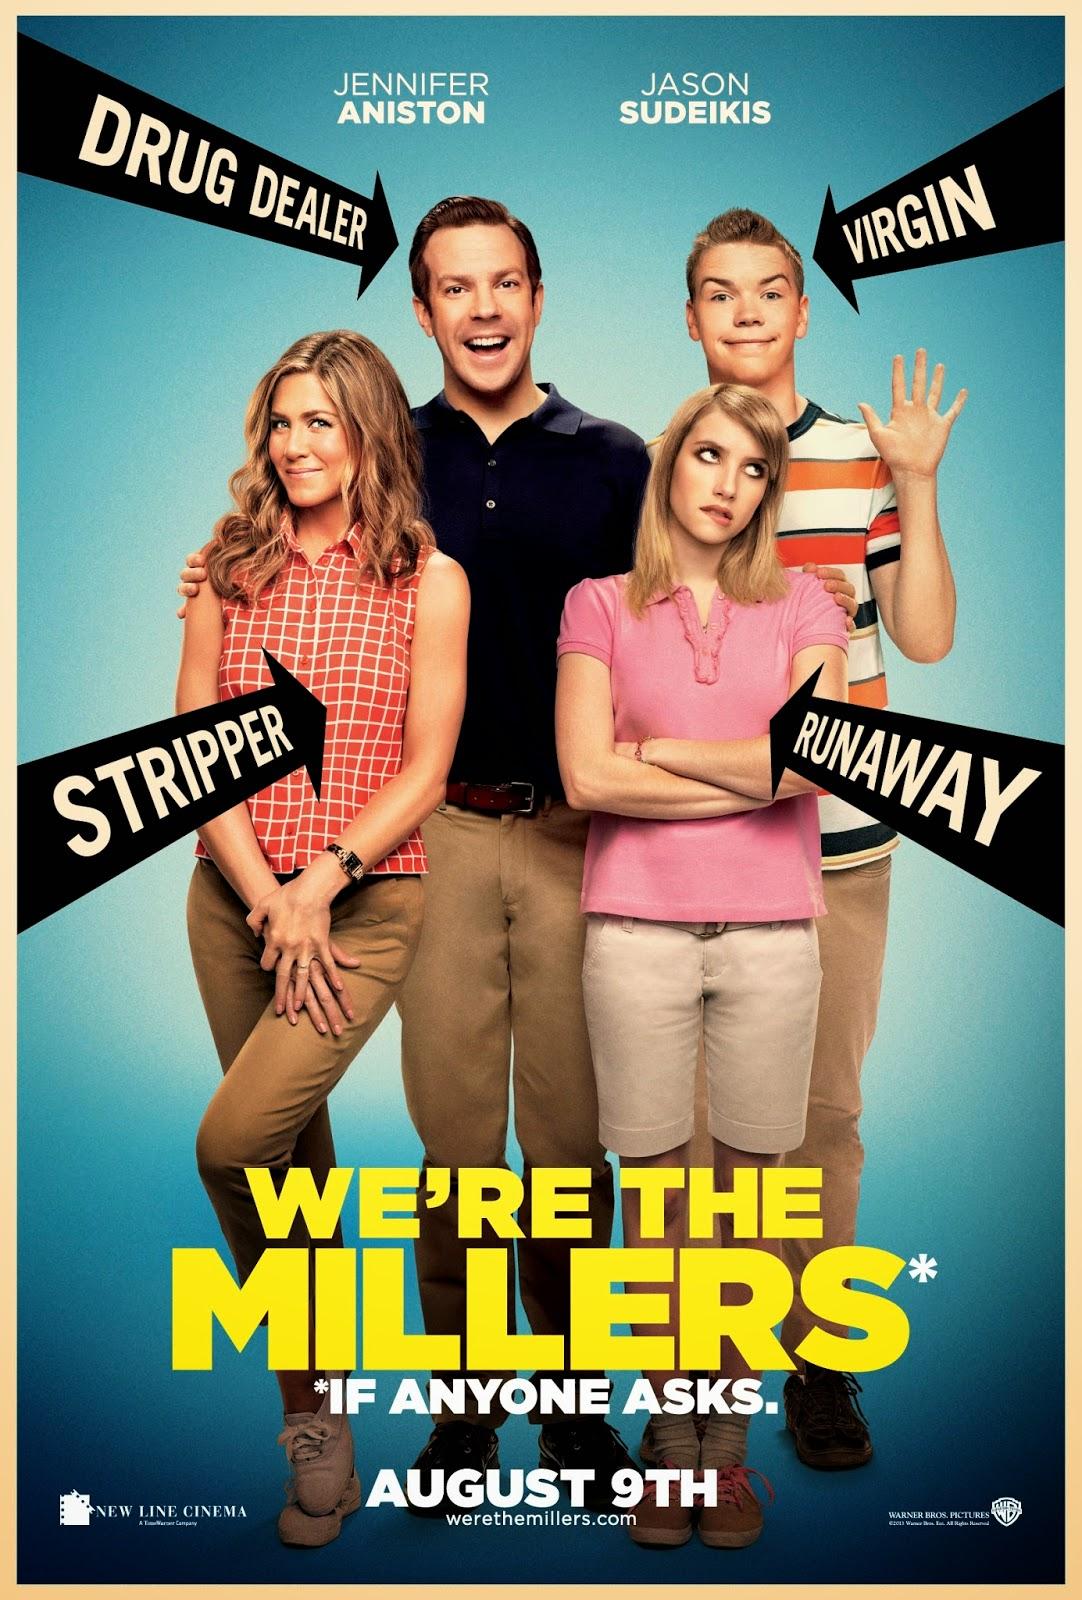 We're the Millers [Extended Cut] (2013) มิลเลอร์ มิลรั่ว ครอบครัวกำมะลอ [ฉบับเต็ม ไม่มีตัด]